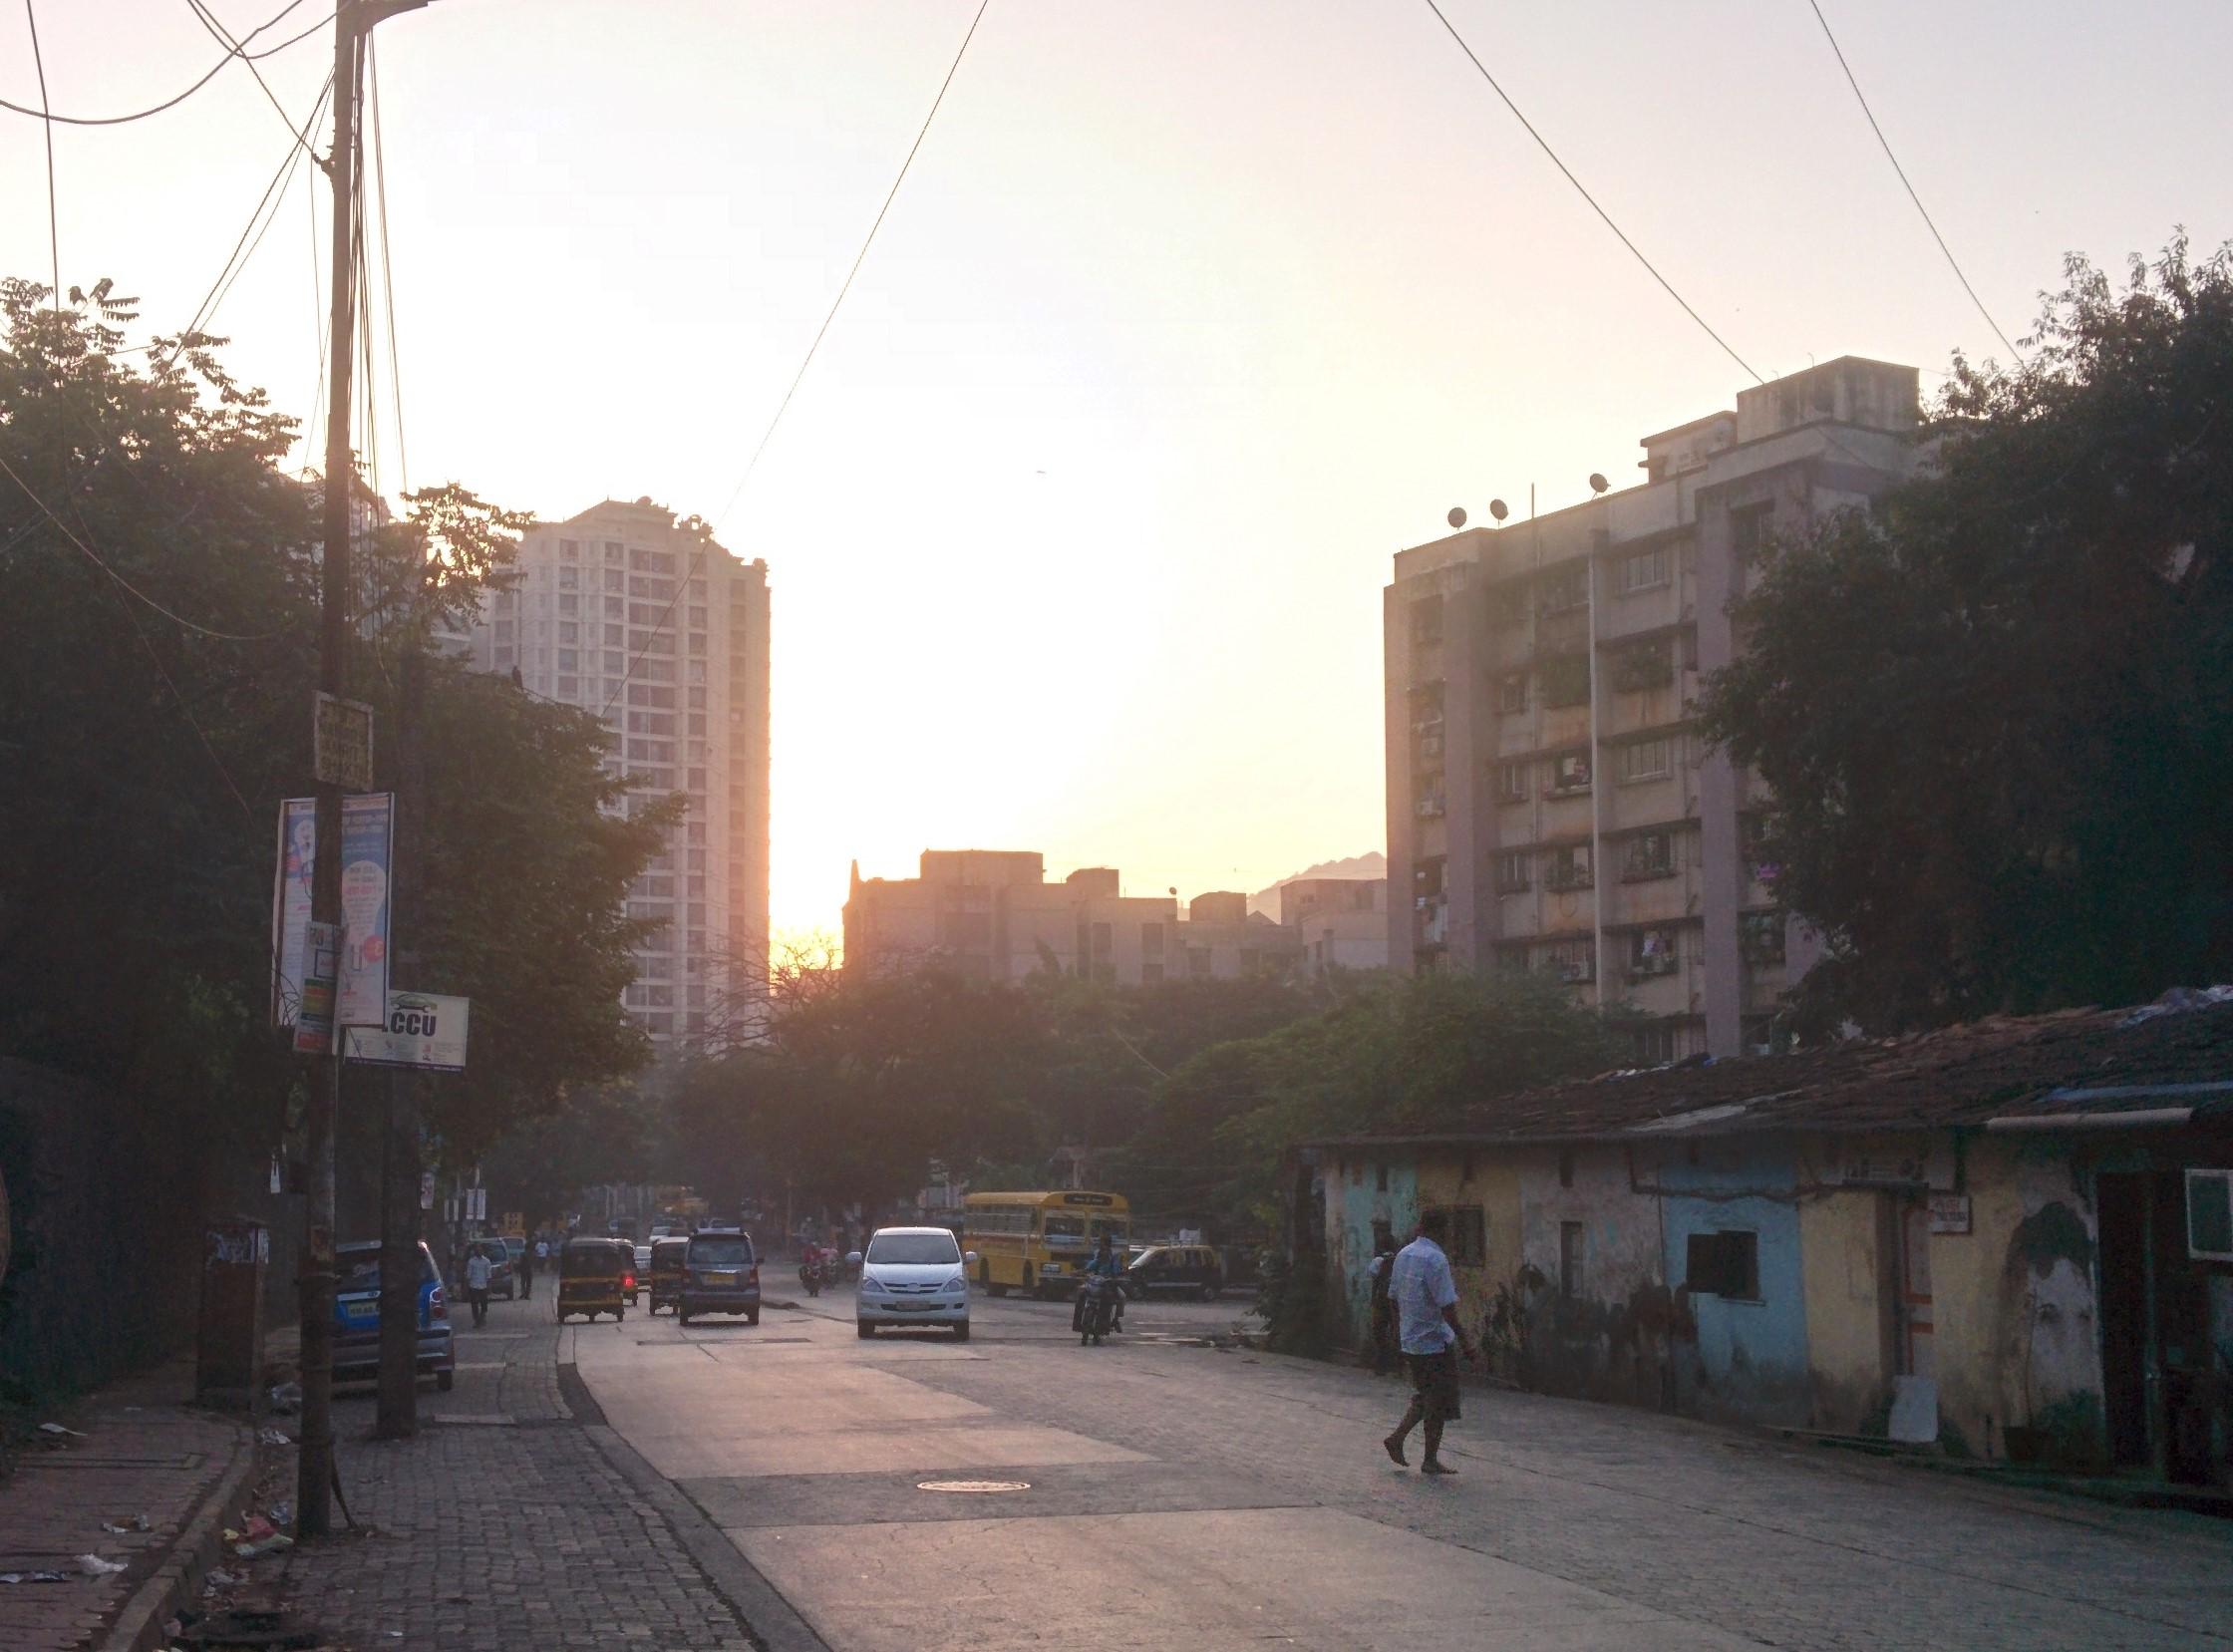 Chandivali Farm Road, right turn Mhada and Singhad College